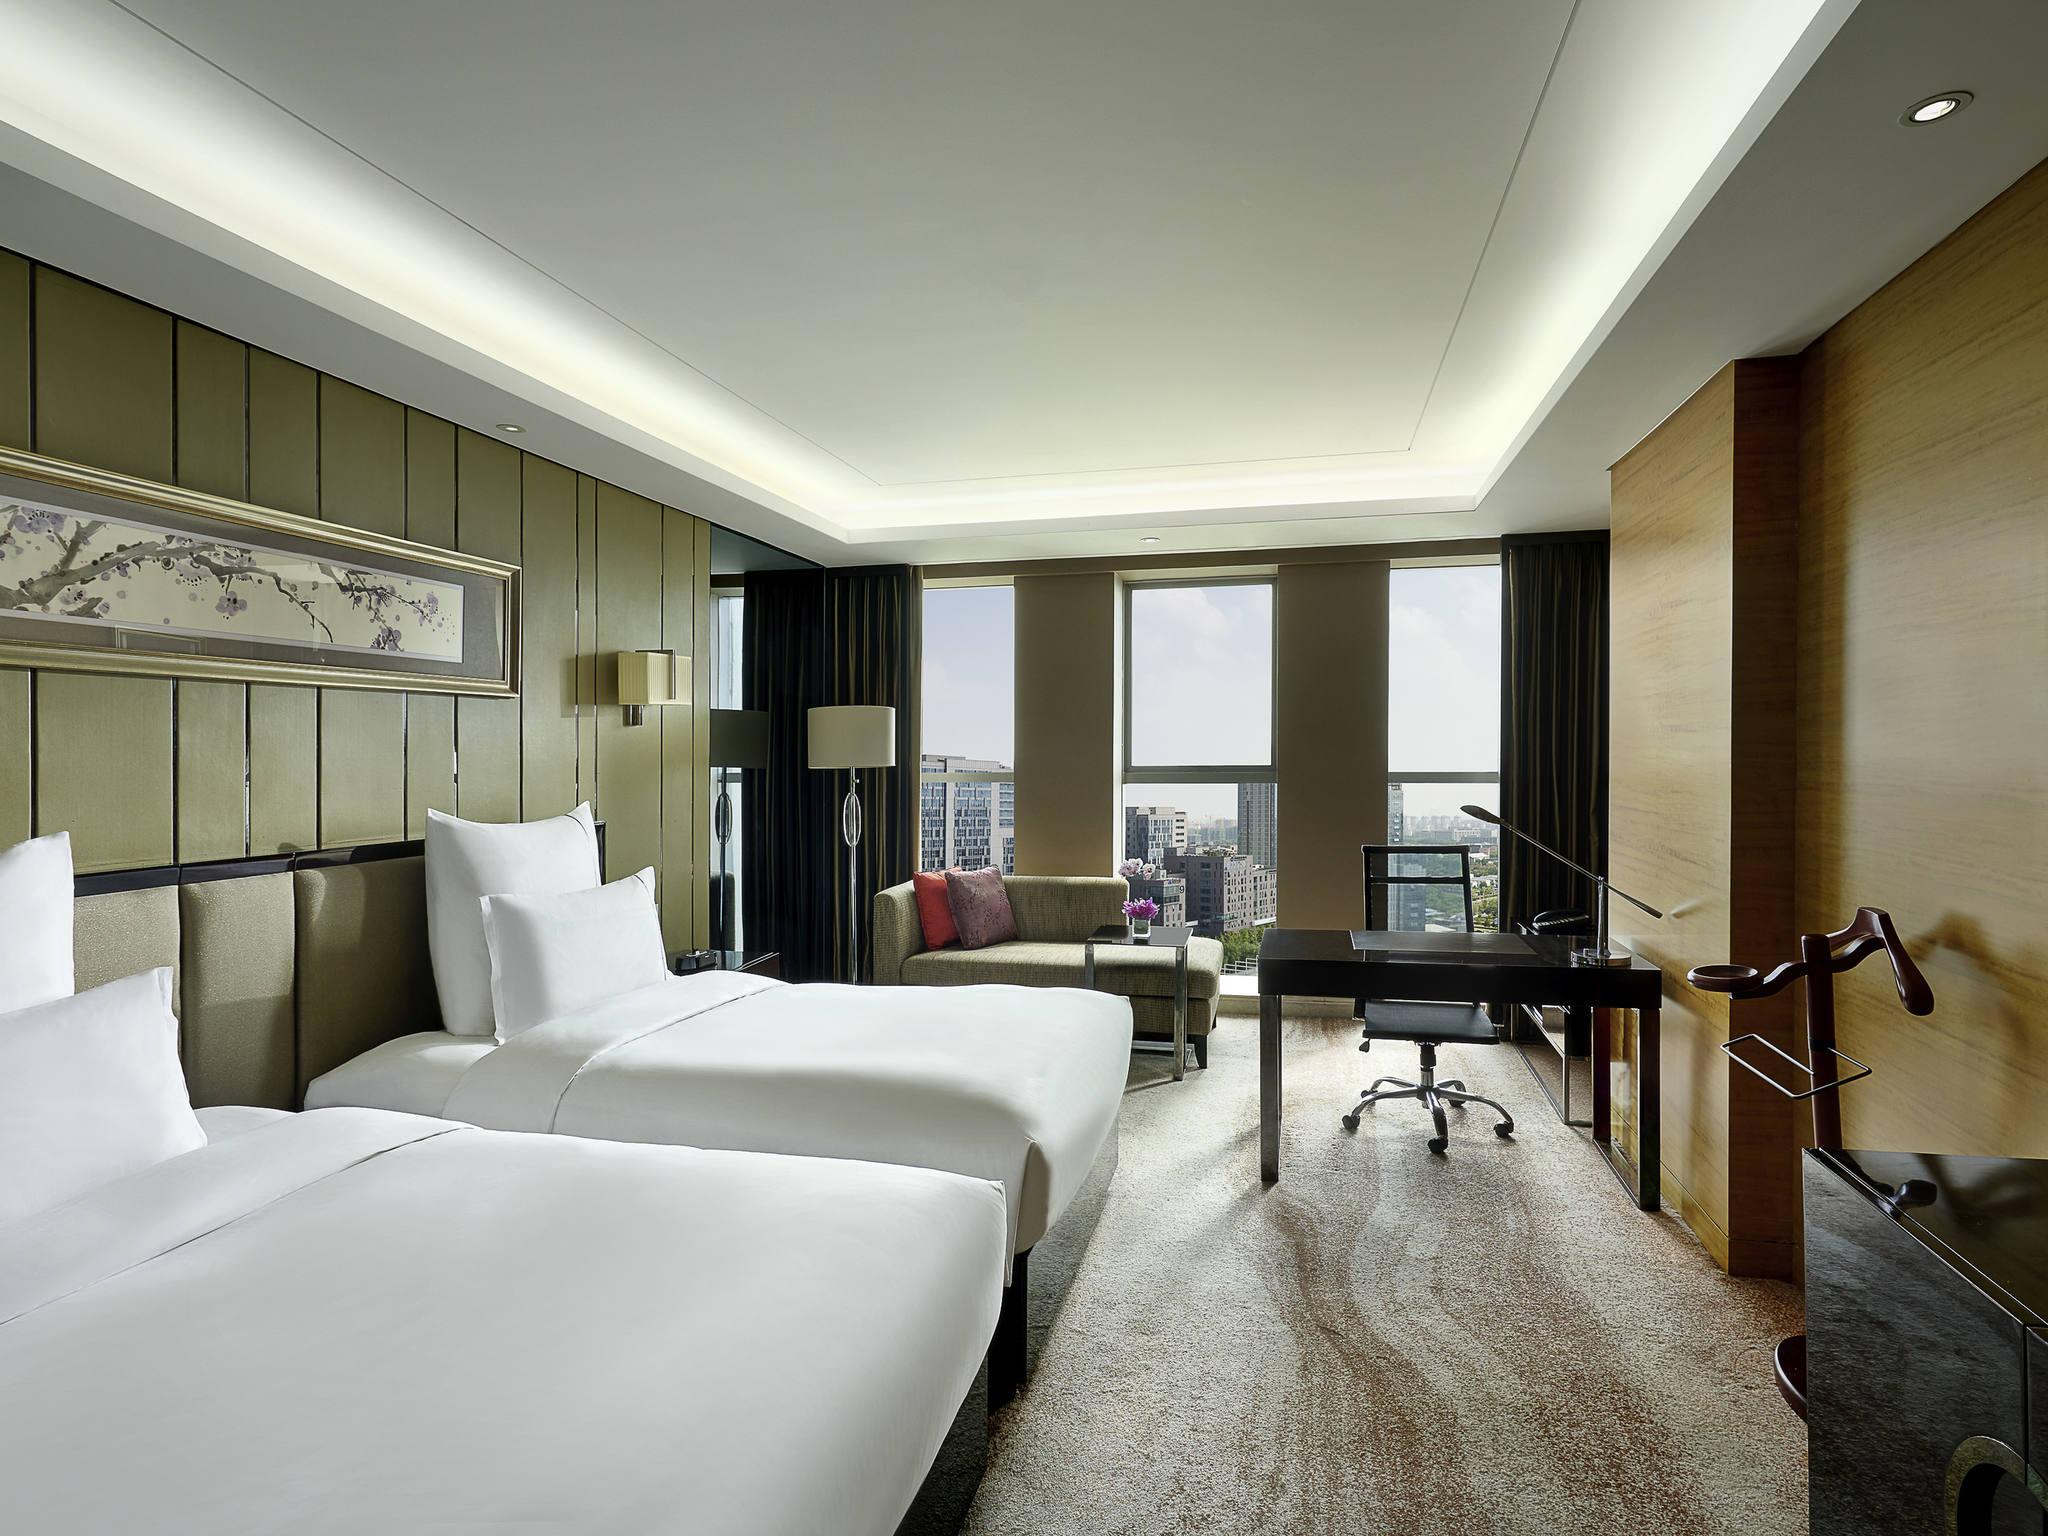 Hotel in WUXI - Pullman Wuxi New Lake